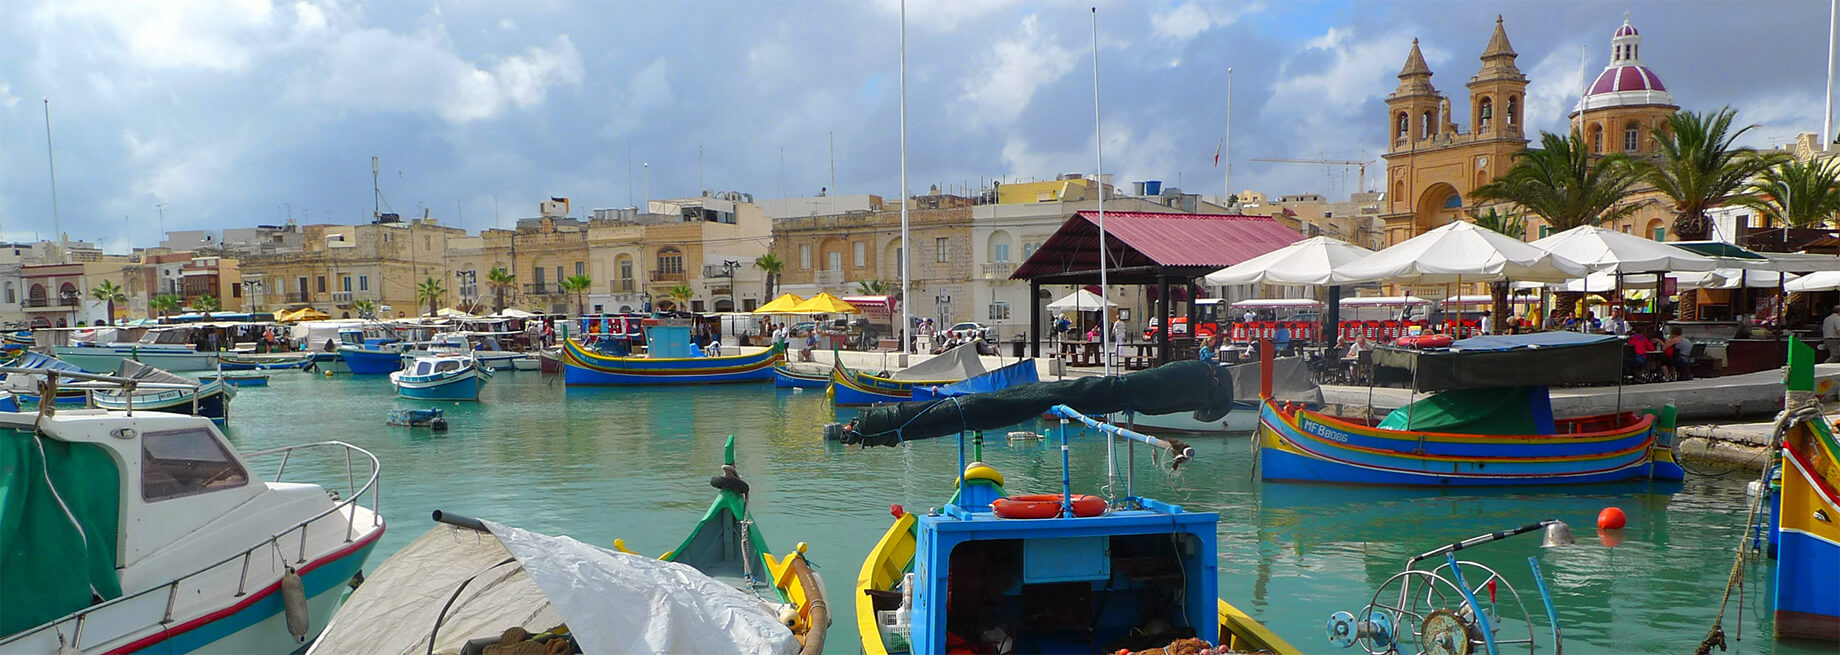 Sea-Heritage-Malte-port